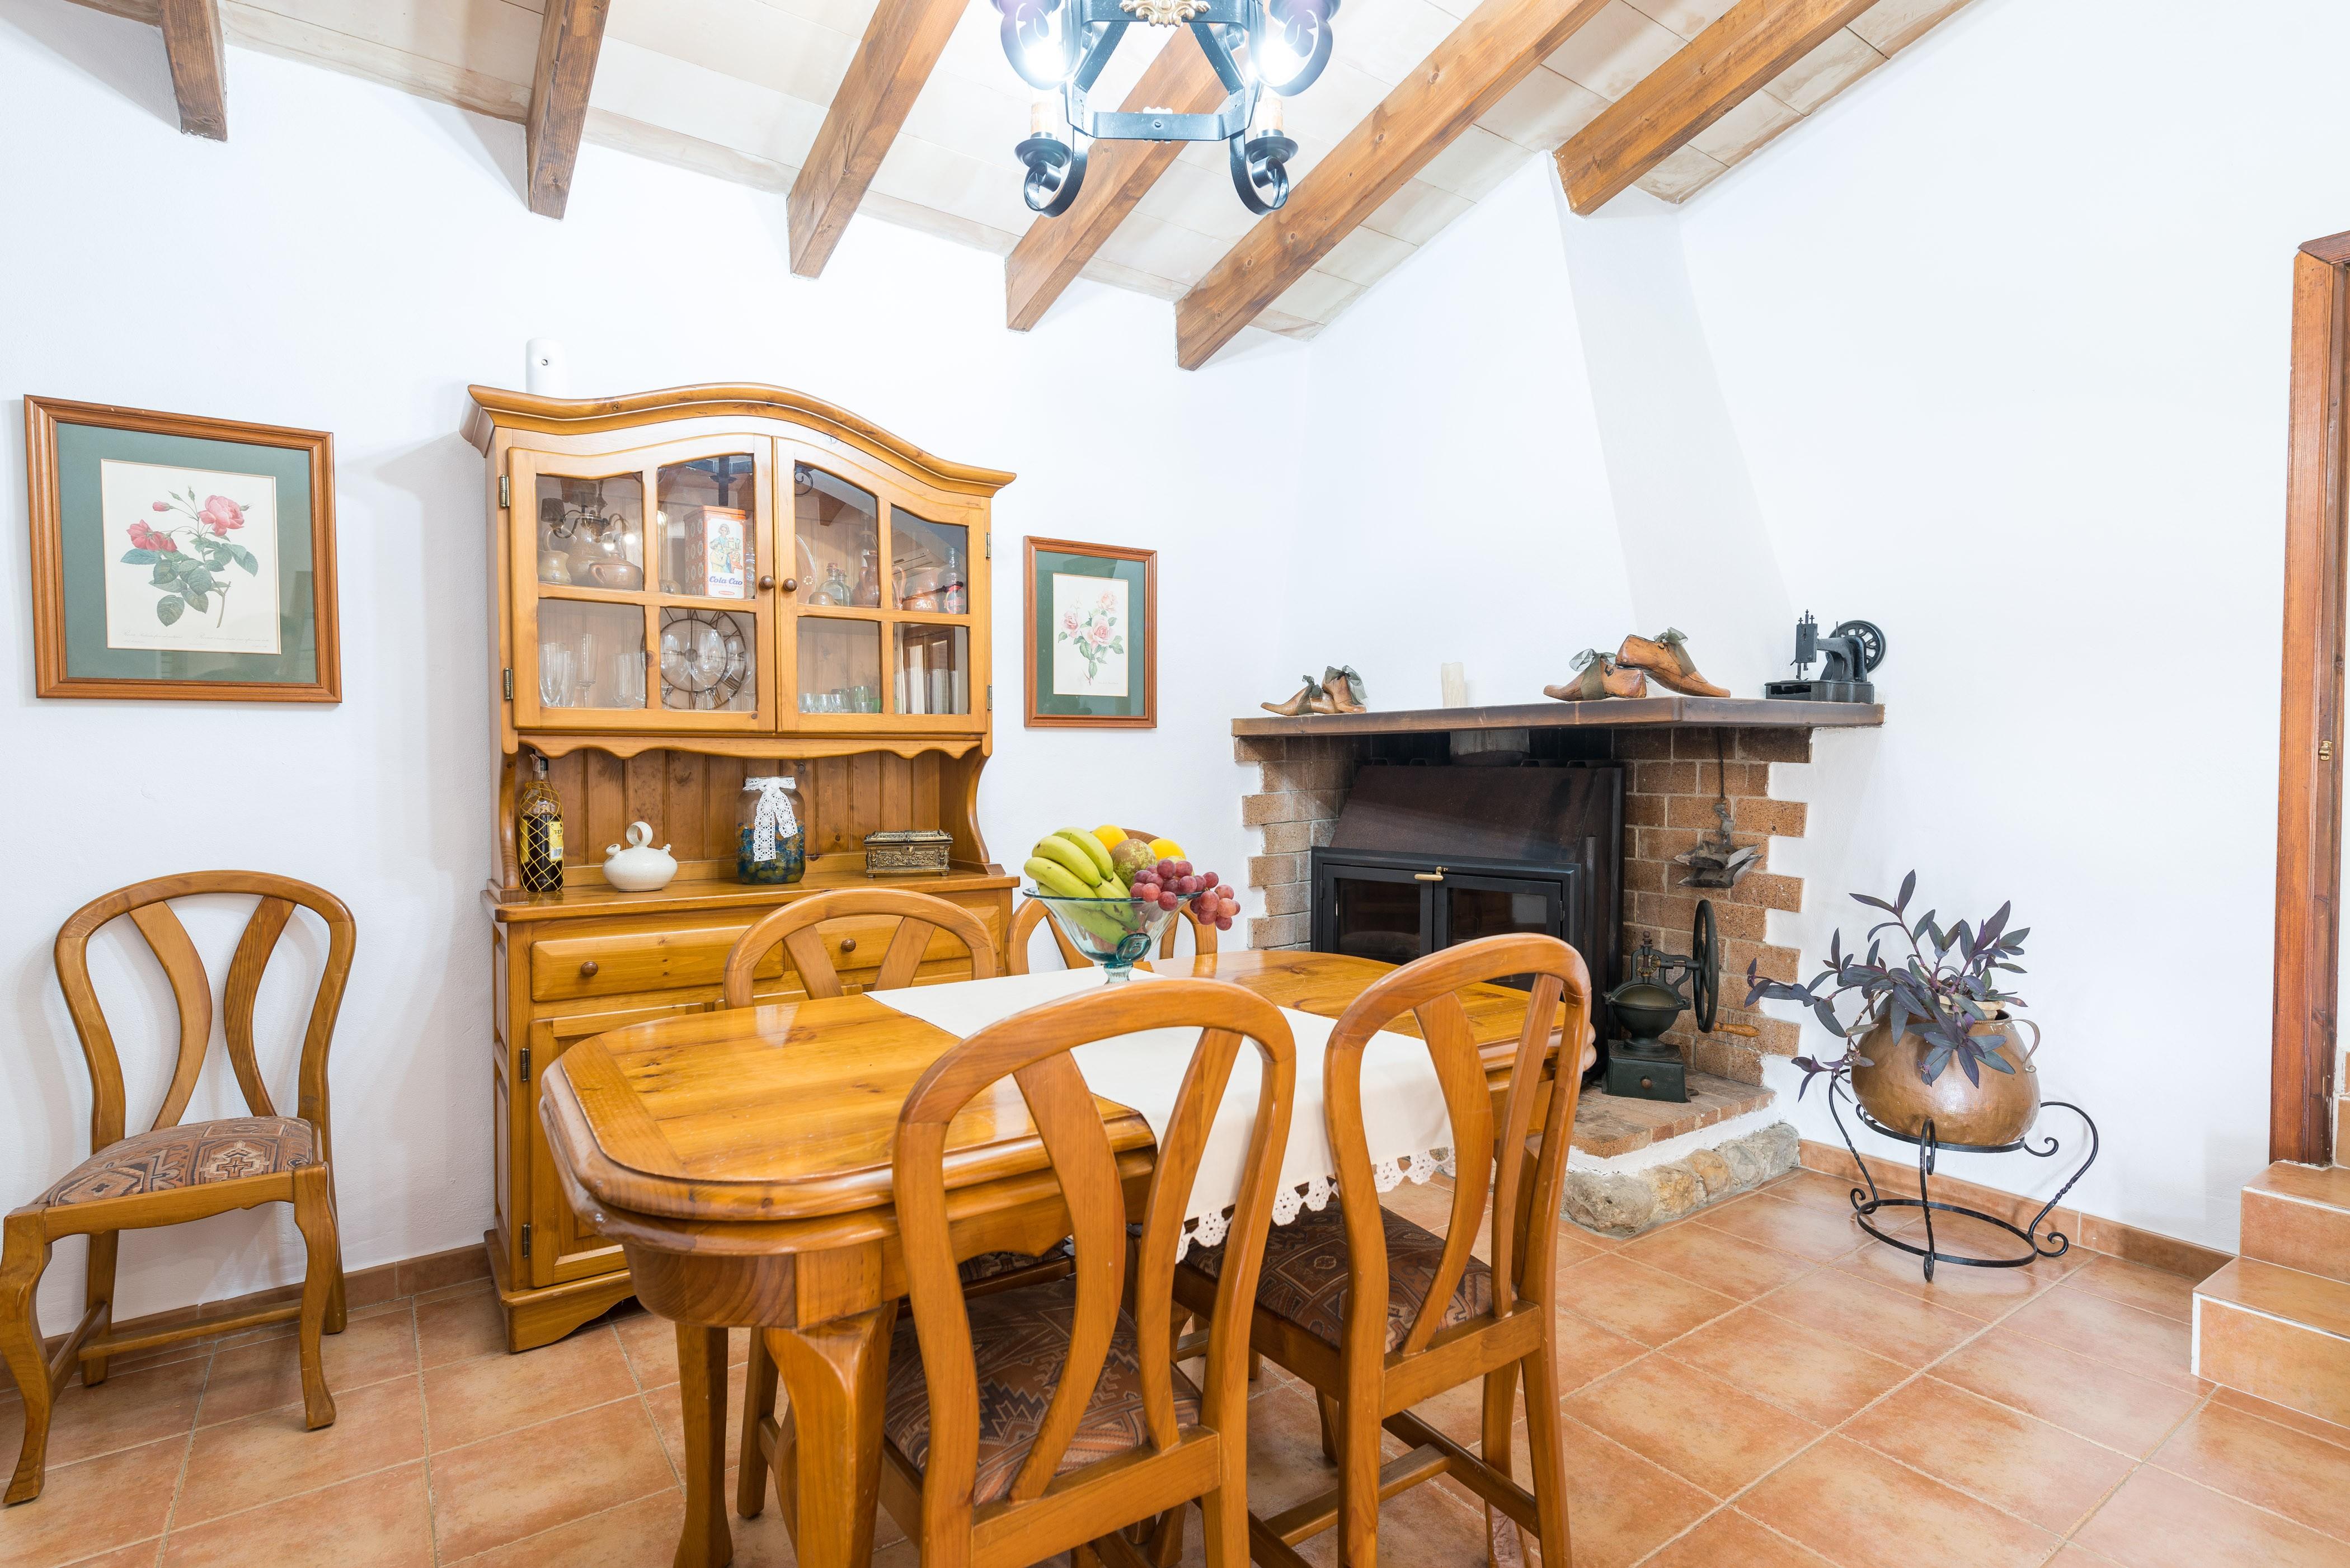 Ferienhaus SON DURINET (2302802), Mancor de la Vall, Mallorca, Balearische Inseln, Spanien, Bild 19